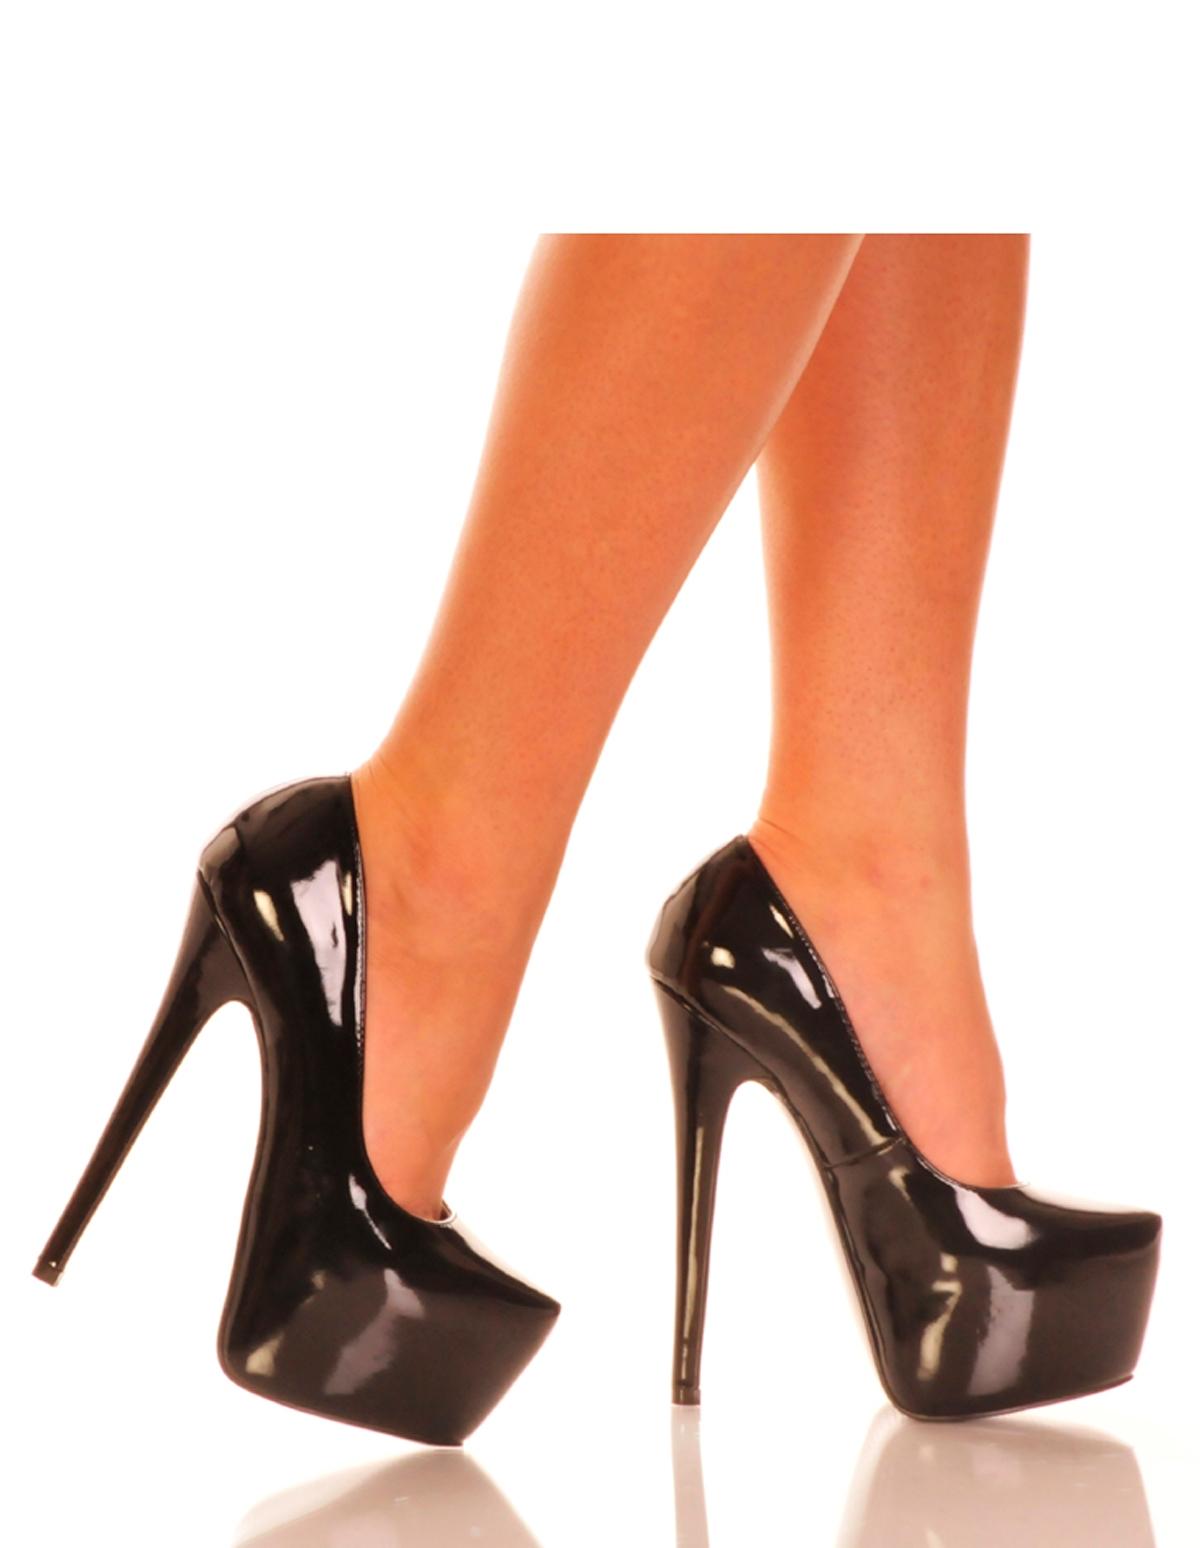 Marquis-11 Shoe